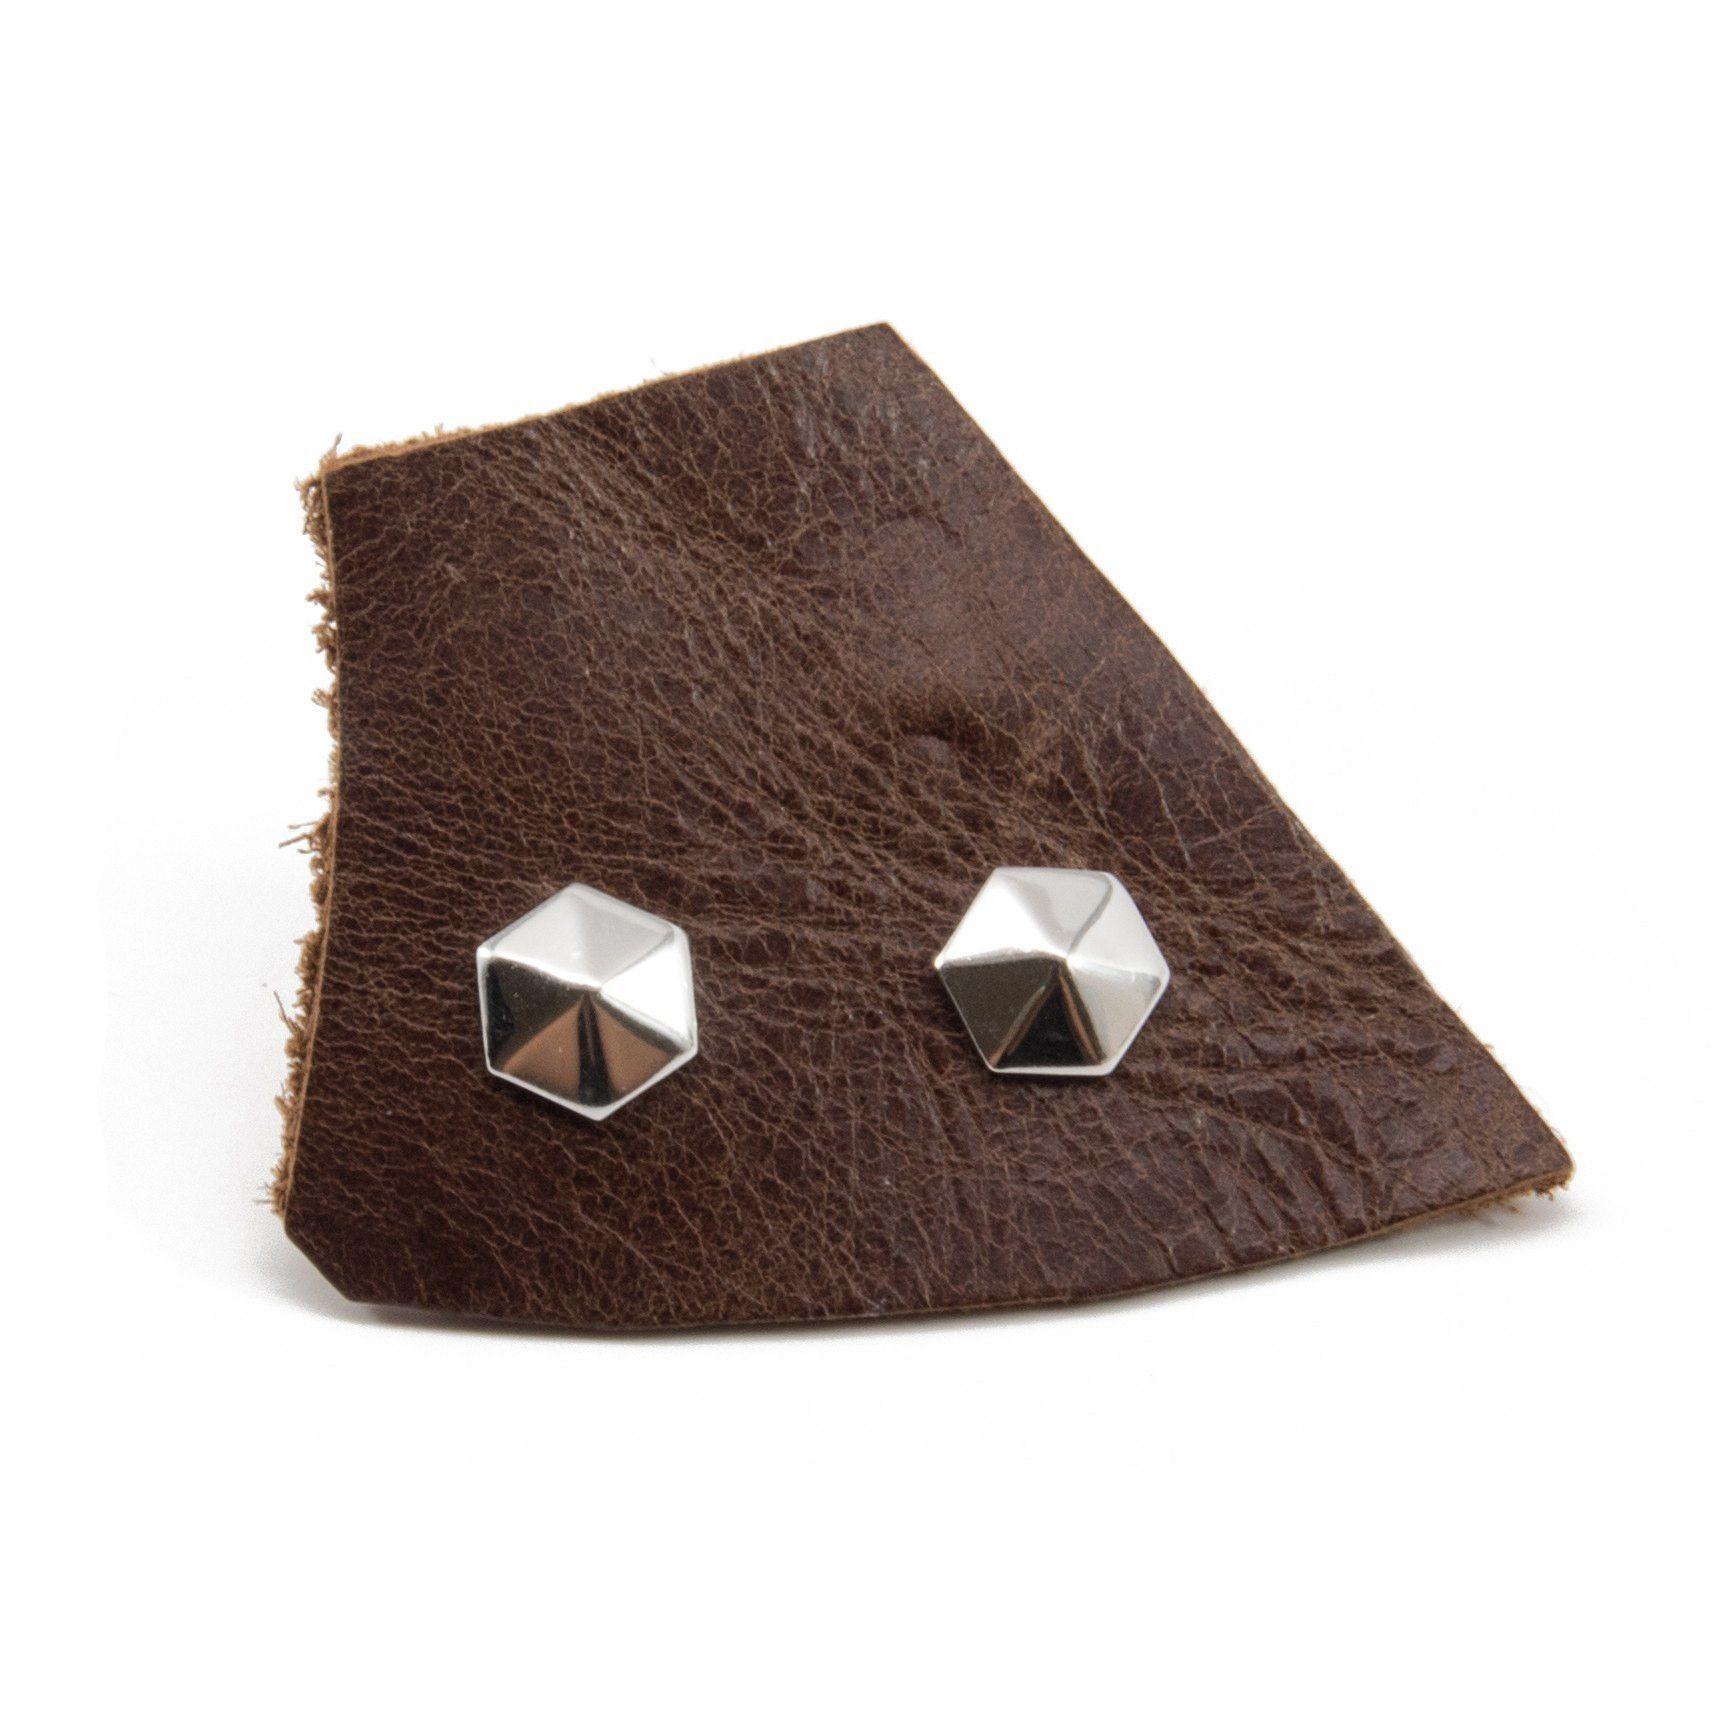 Lifted Hexagon Studs